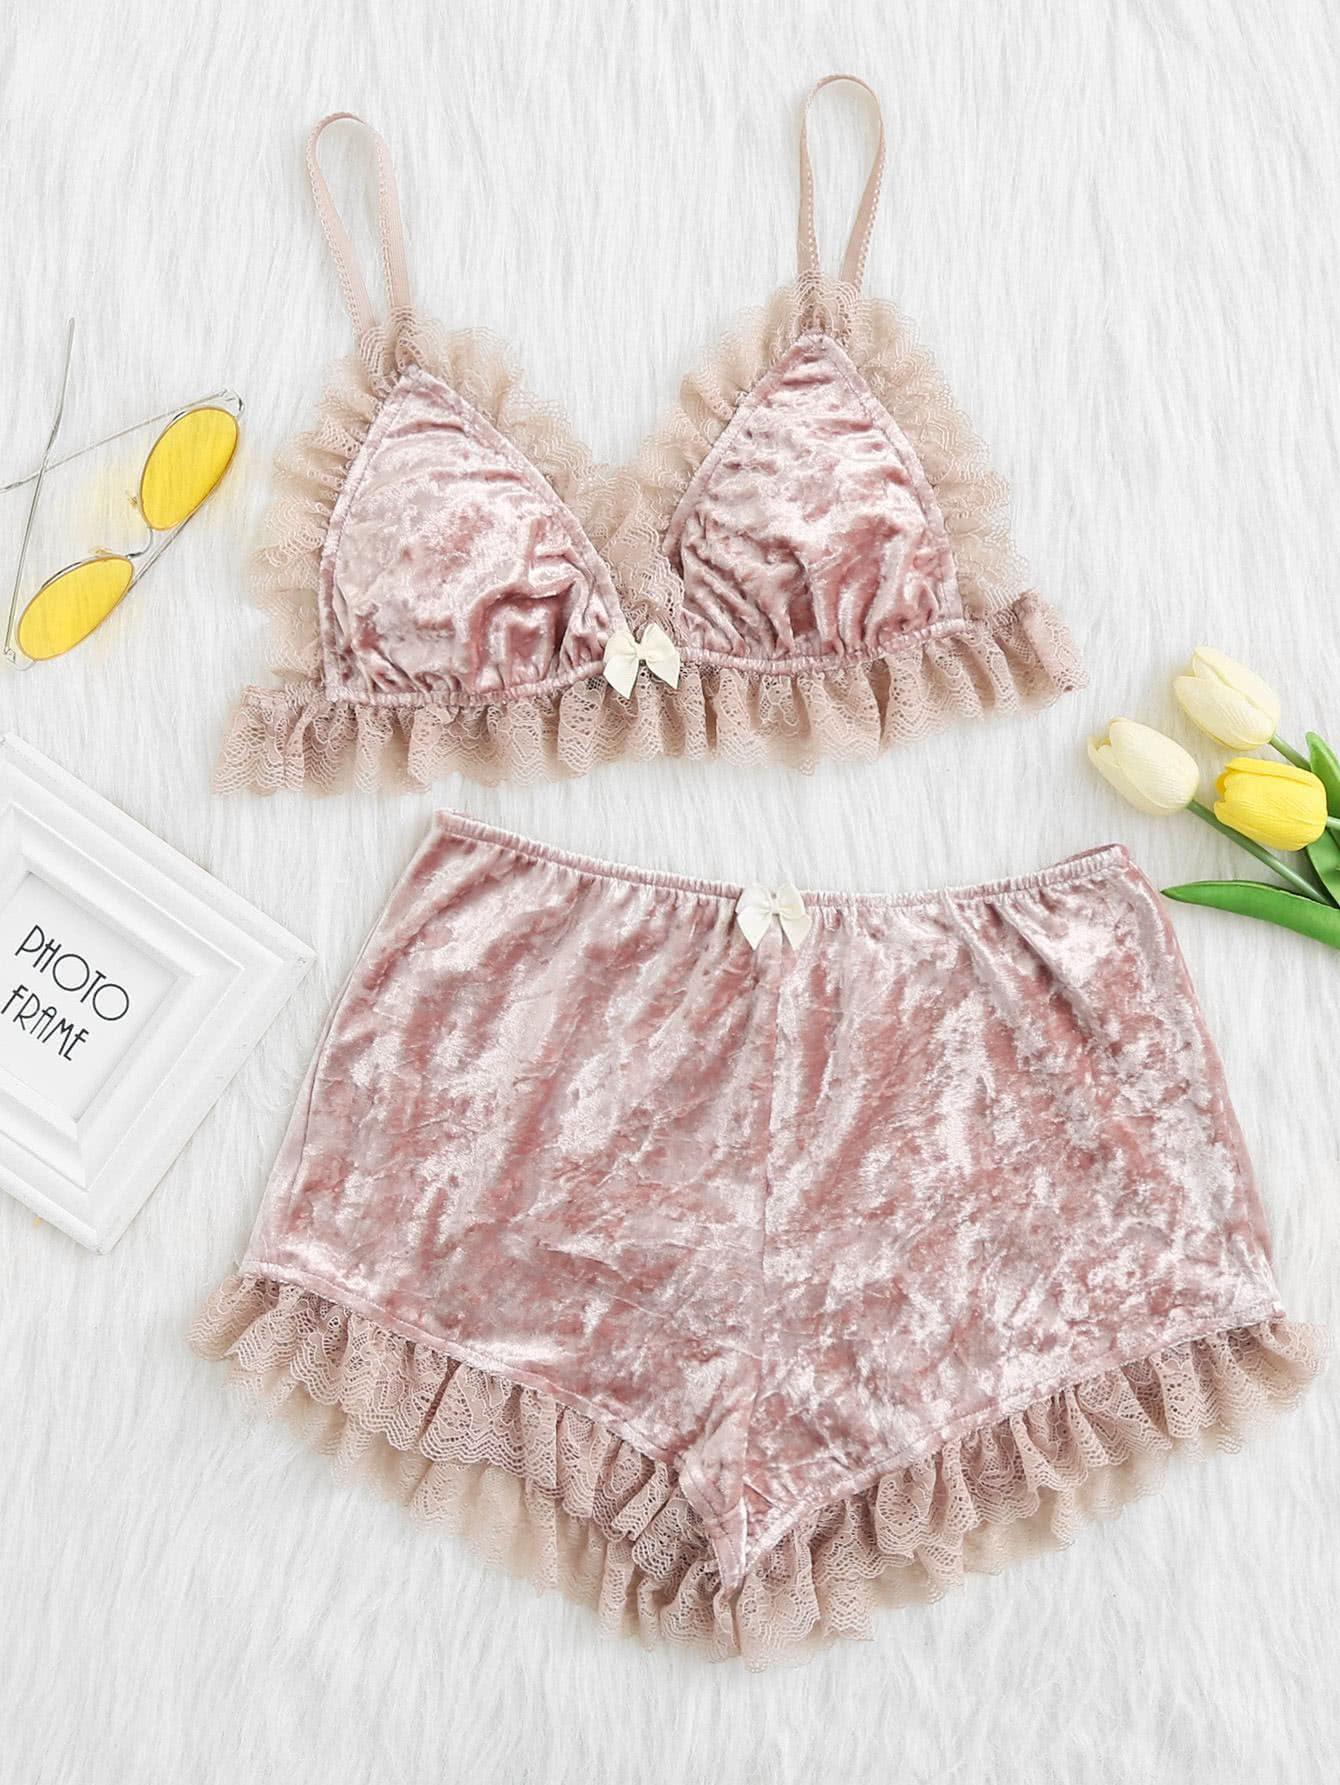 ee7286d73c #SheIn - #SheIn Lace Trim Crushed Velvet Bralette & Shorts Pj Set -